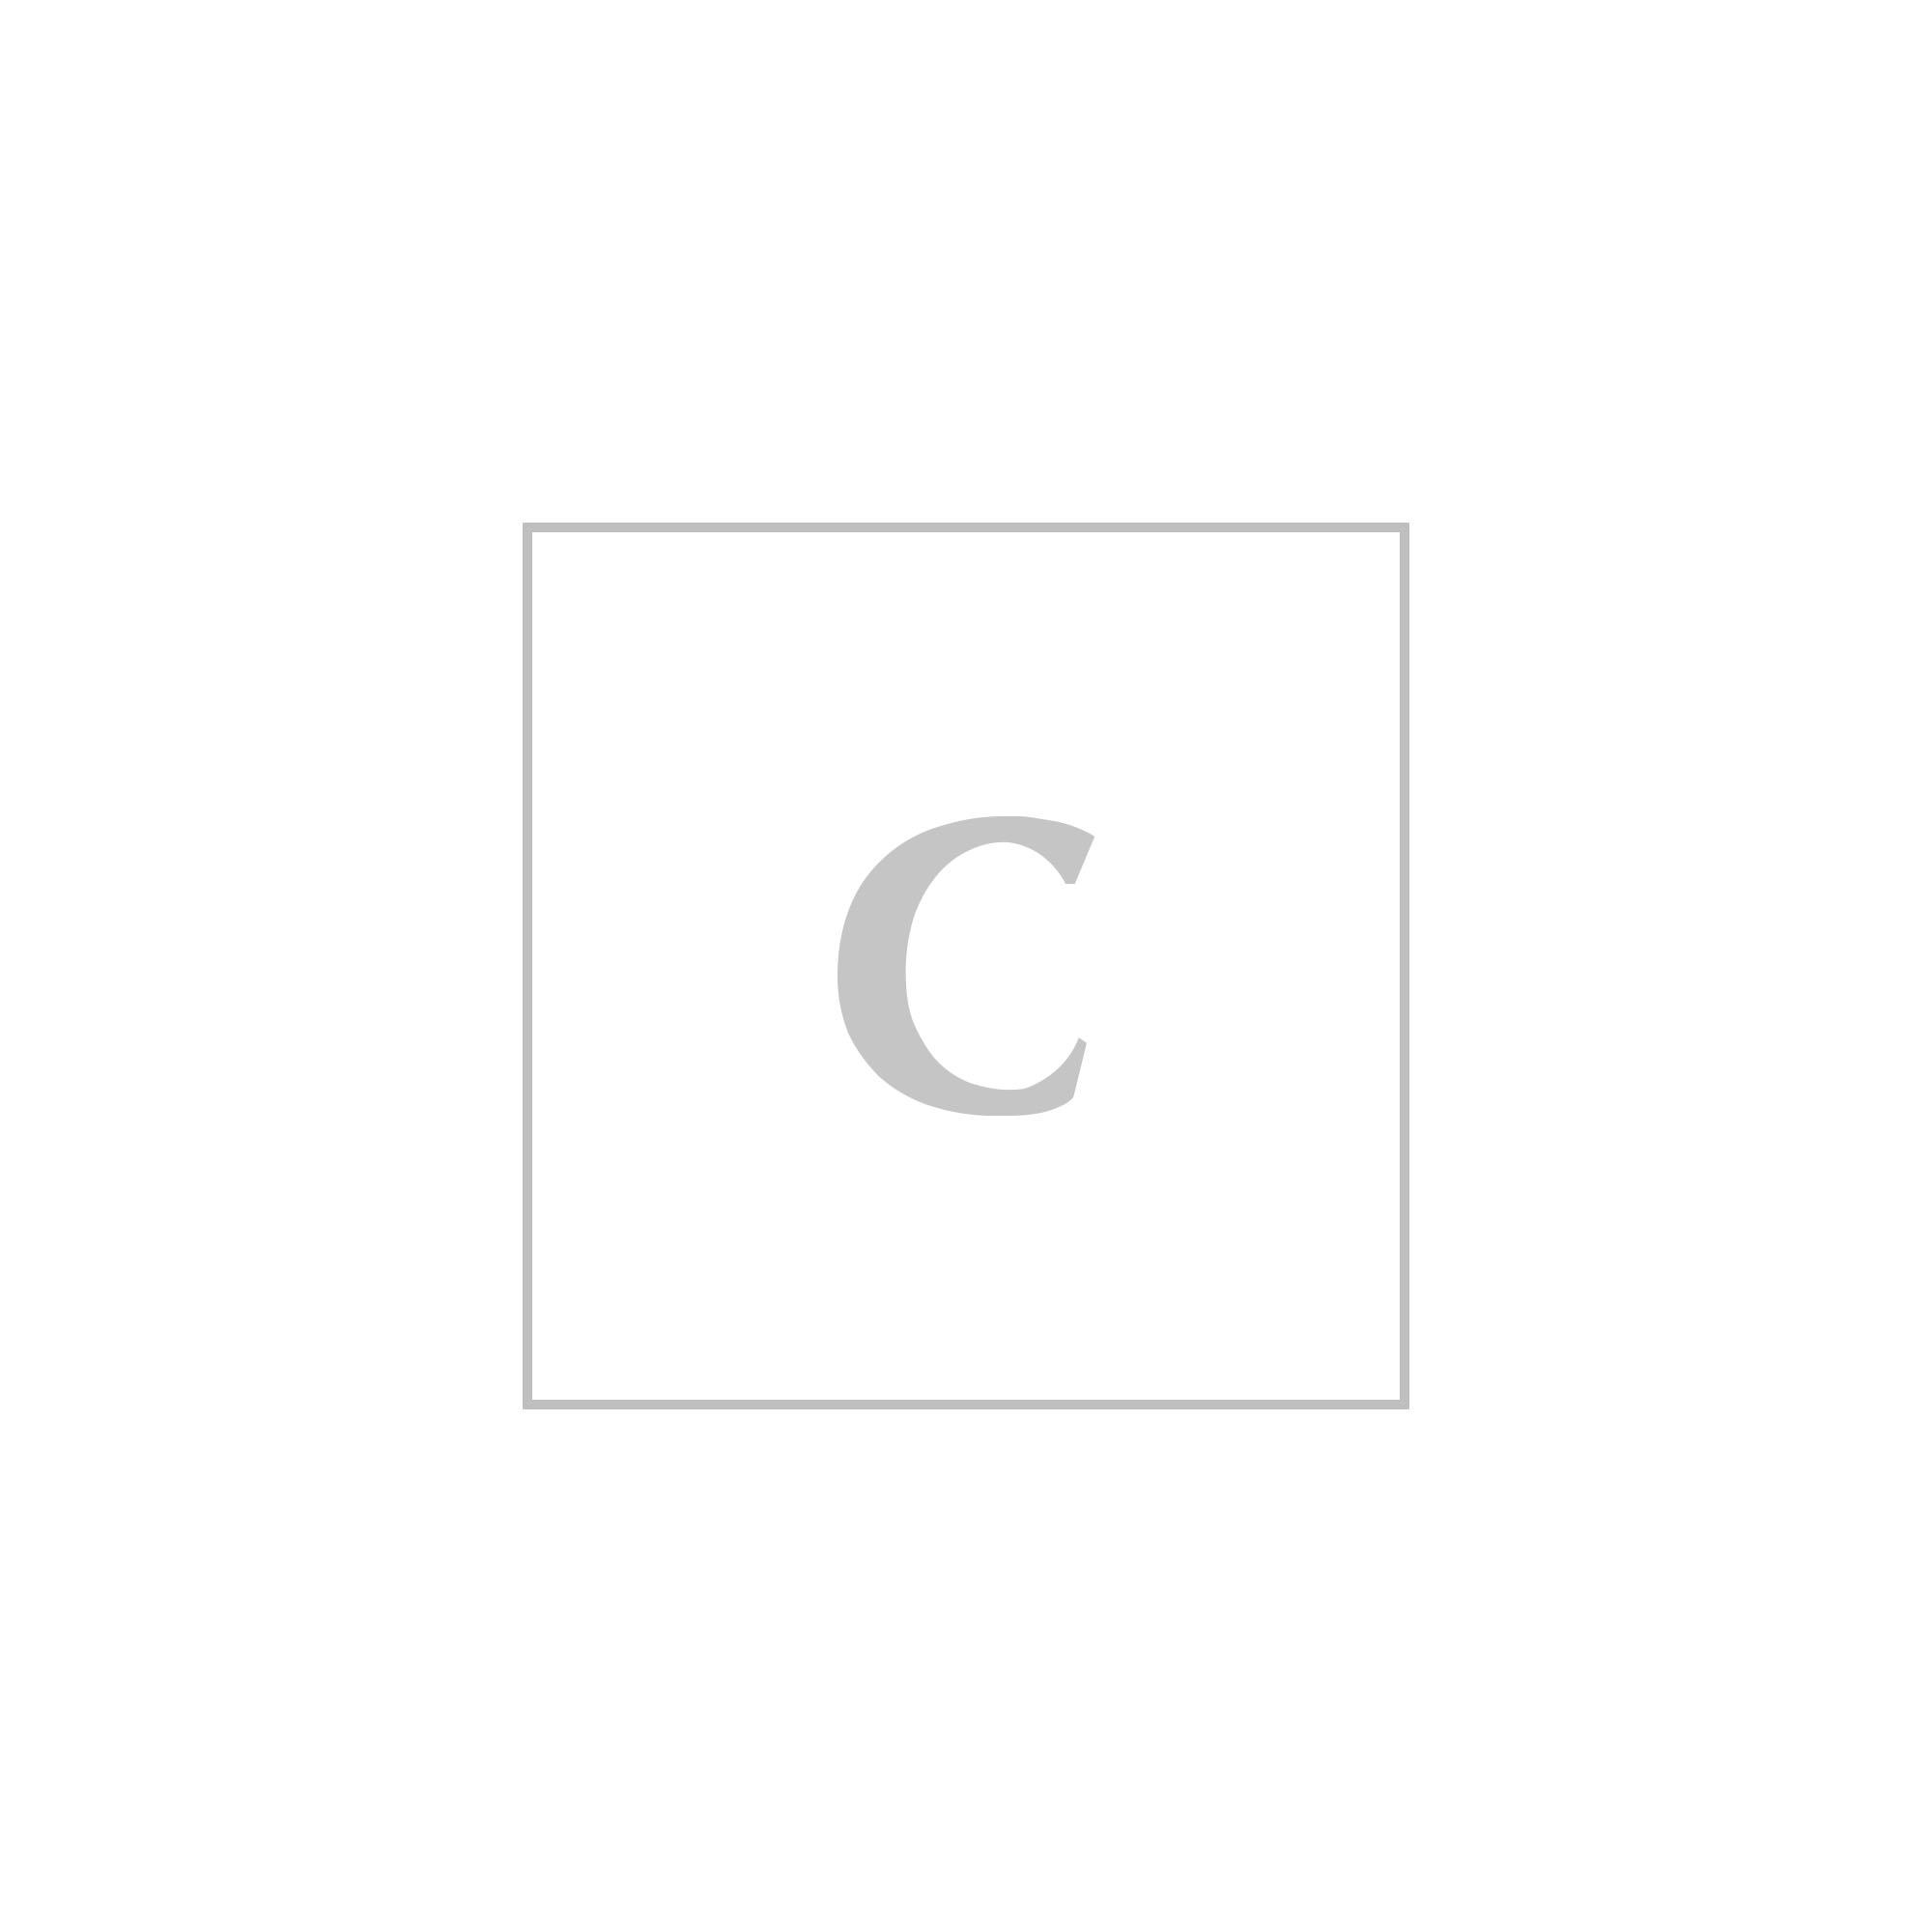 Christian Dior borsa openbar